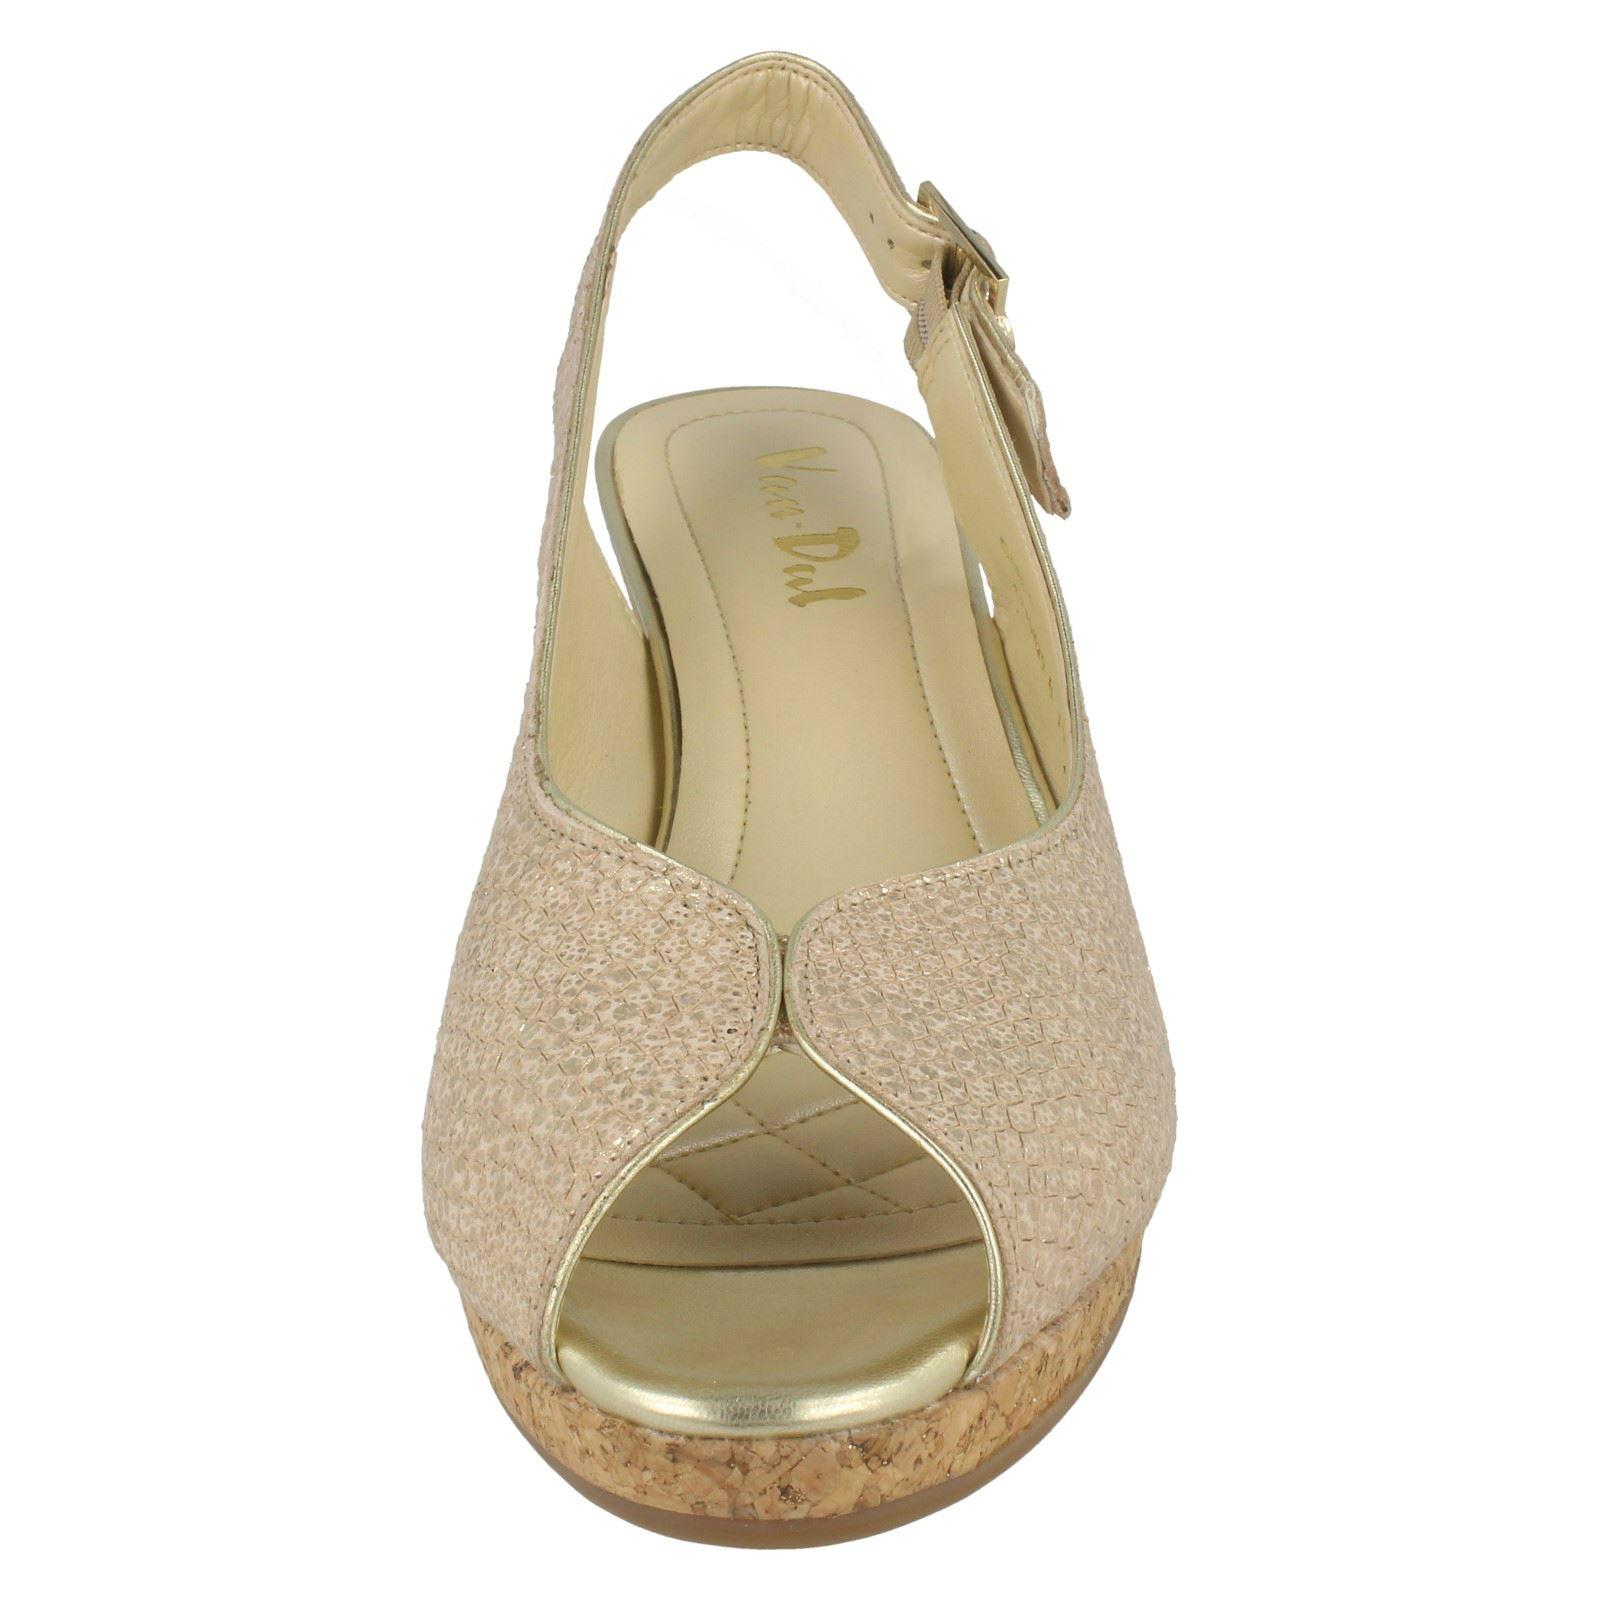 Ladies-Van-Dal-Cork-Wedge-Sandals-Gable thumbnail 8